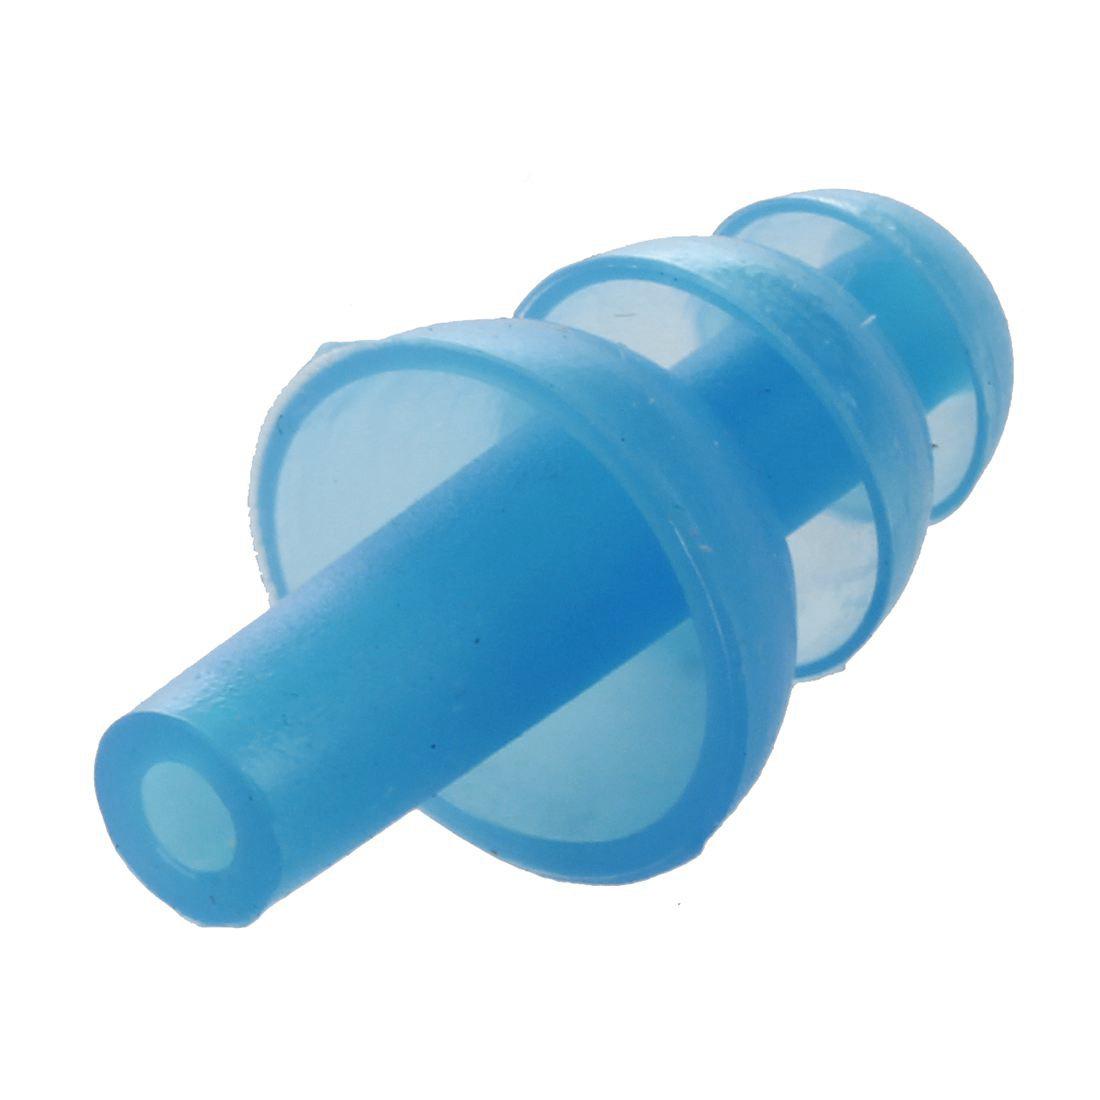 10X 1 Paar Schwimmen Flexibler Silikon Ohrstoepsel - C7M9 10X SODIAL R 10X